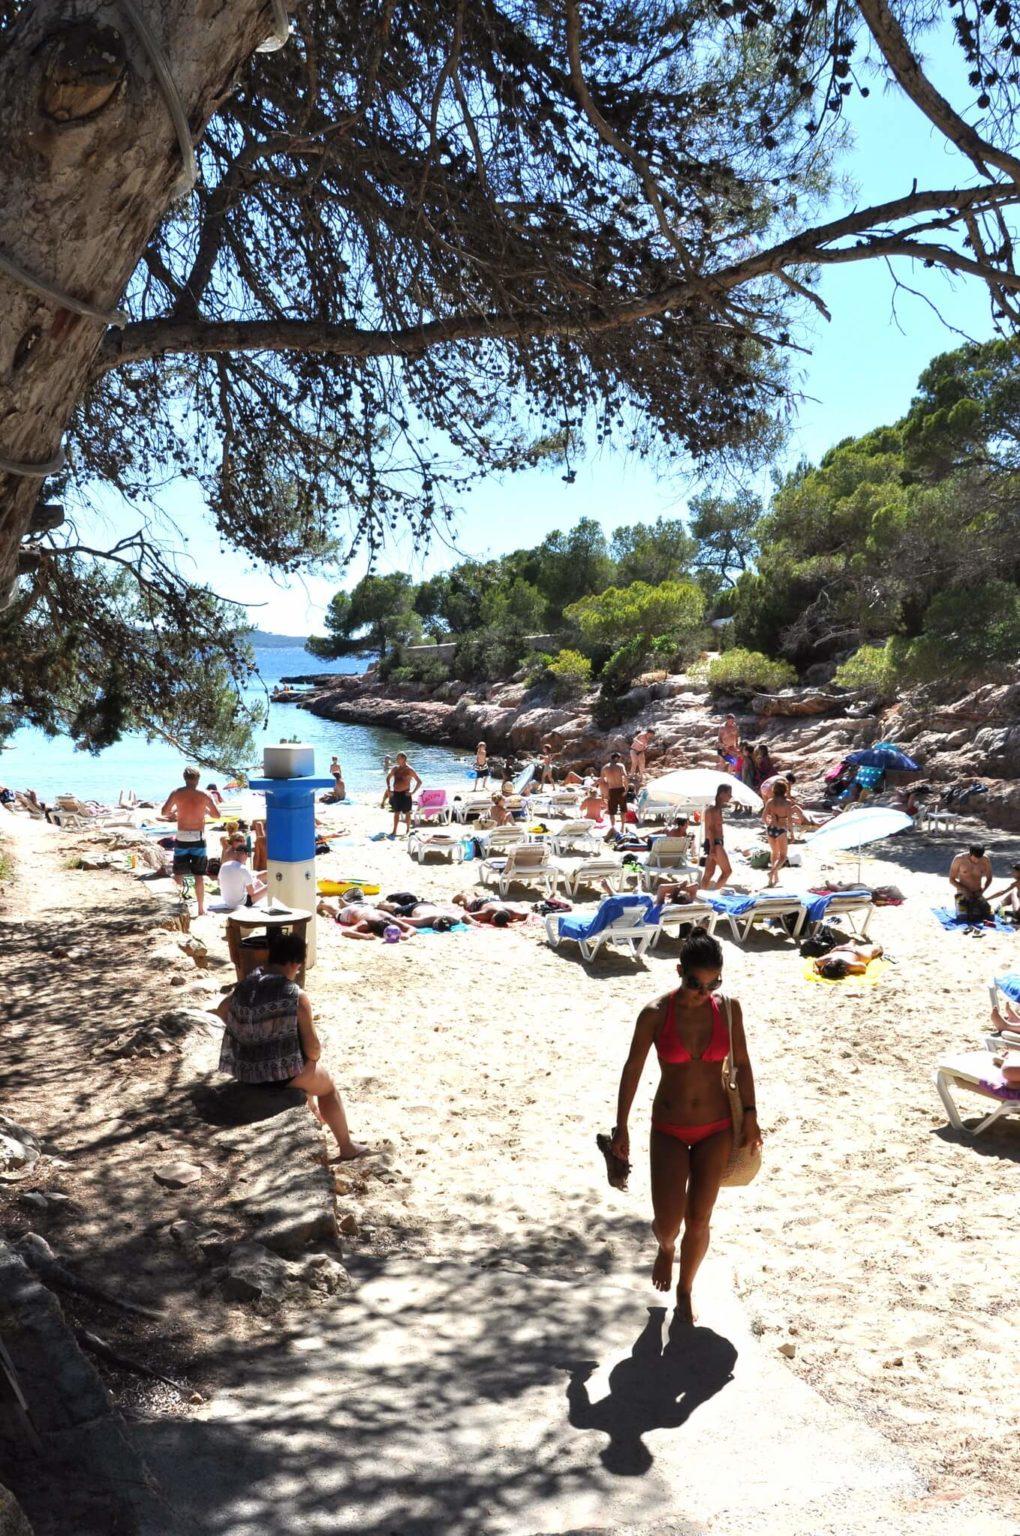 https://www.white-ibiza.com/wp-content/uploads/2020/03/ibiza-beaches-cala-gracioneta-03-1020x1536.jpg